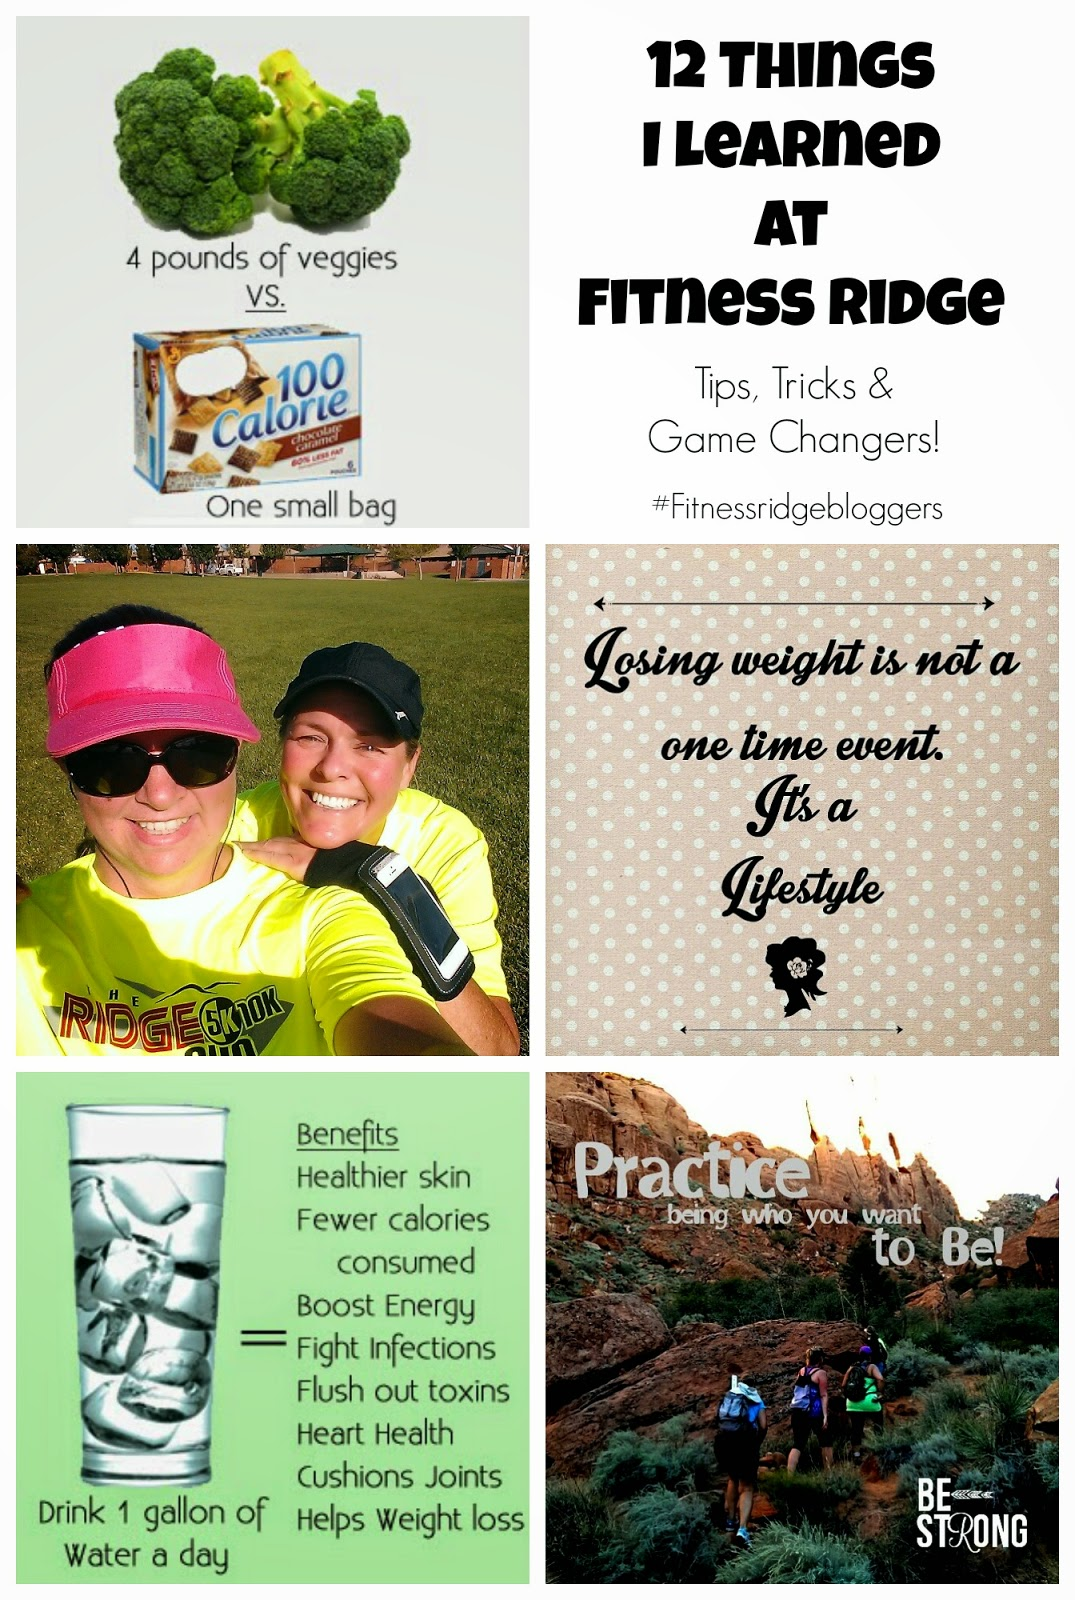 12 things I learned at Fitness Ridge Ranch #fitnessridgebloggers #healthtips